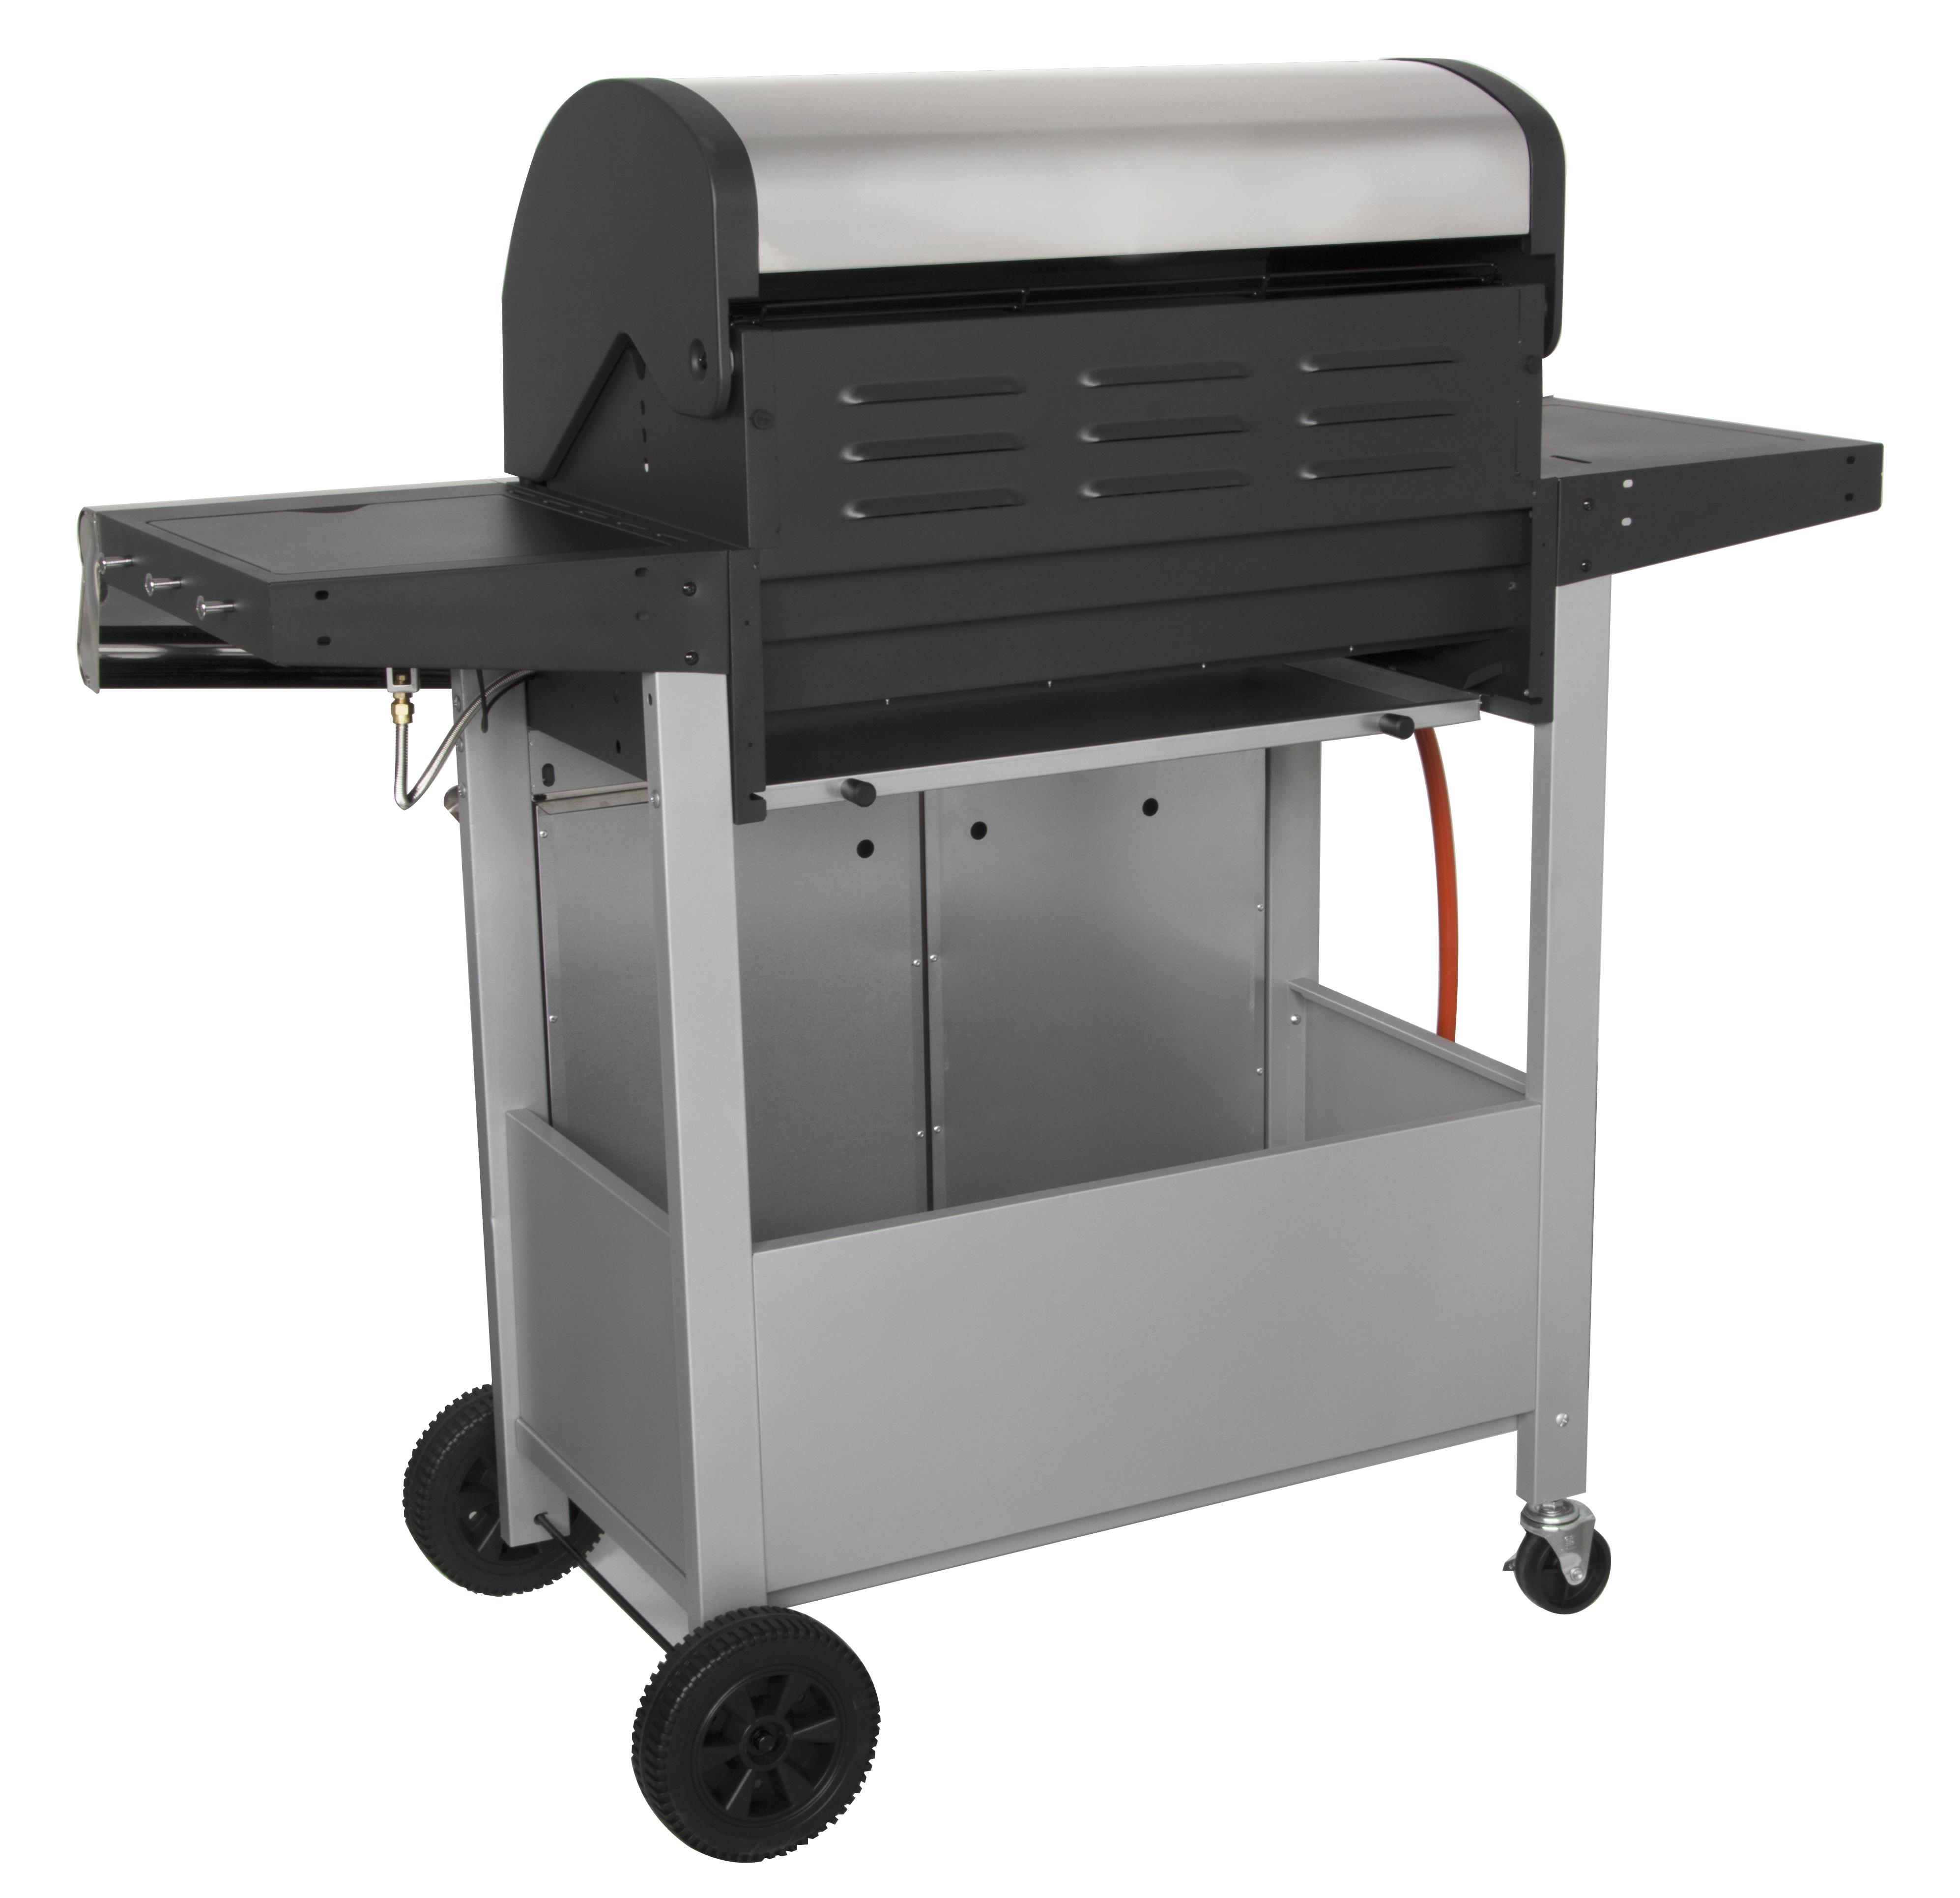 4 Burners Gas Barbecue